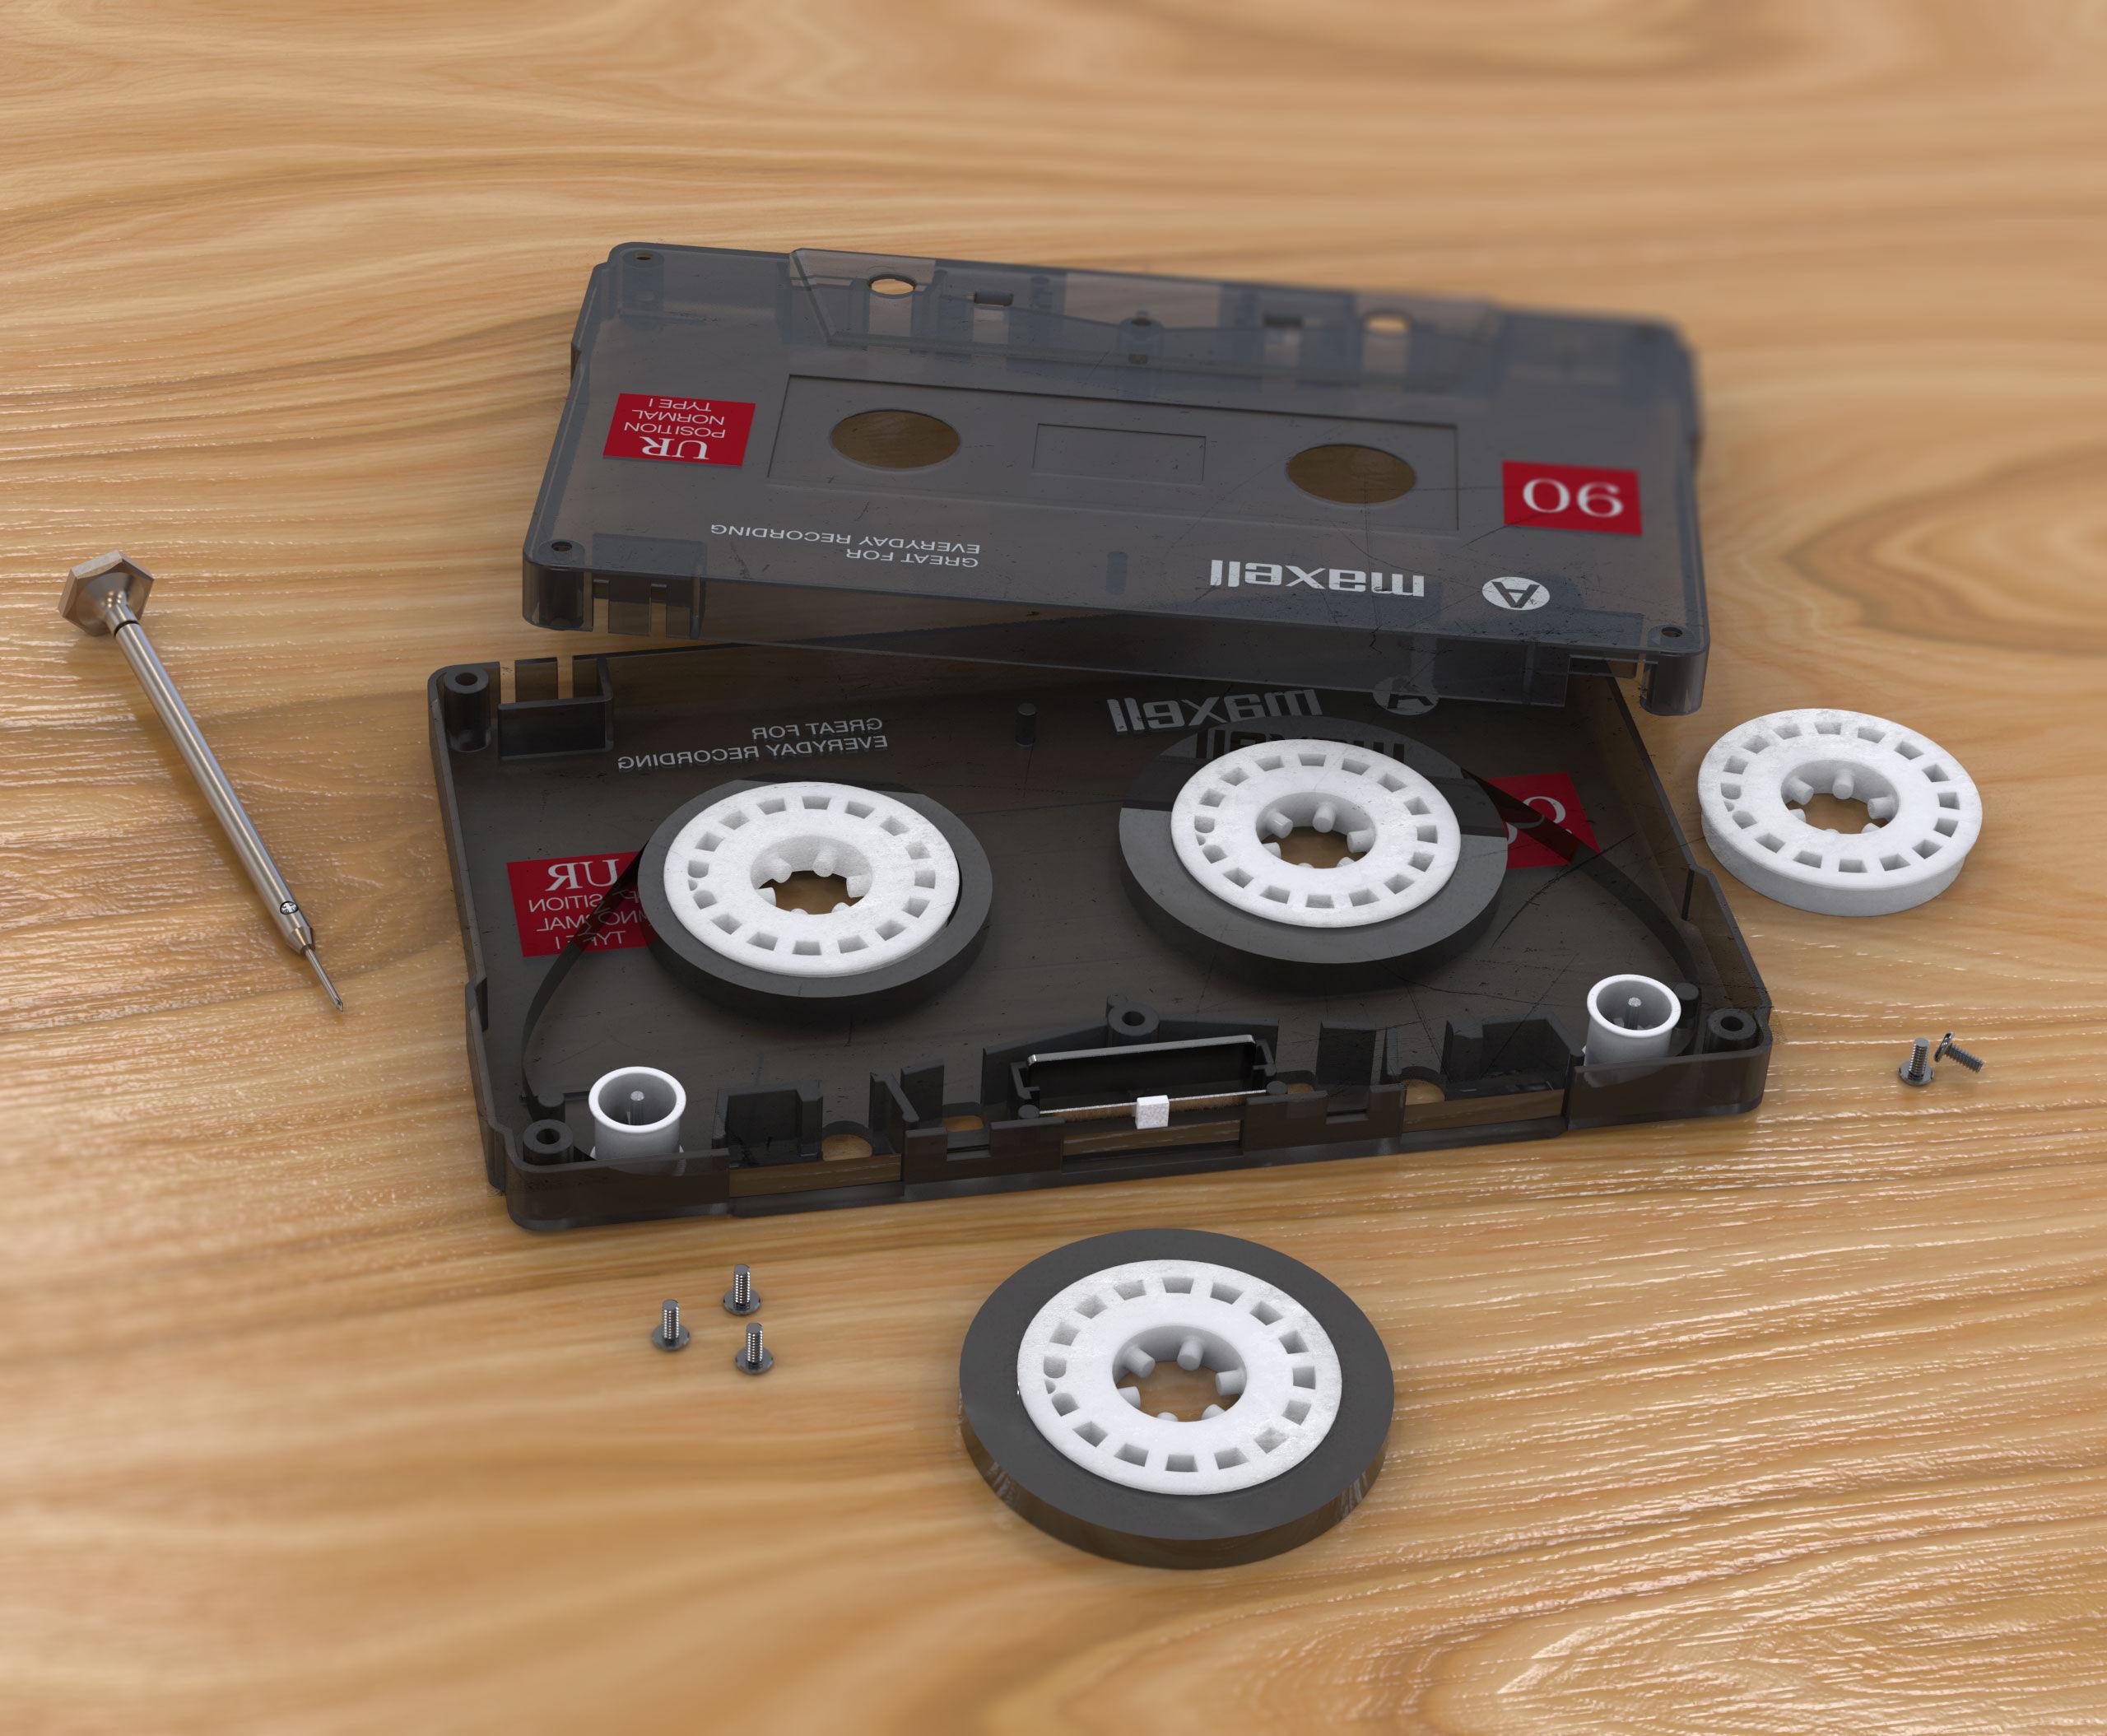 New-tape-42-3500-3500